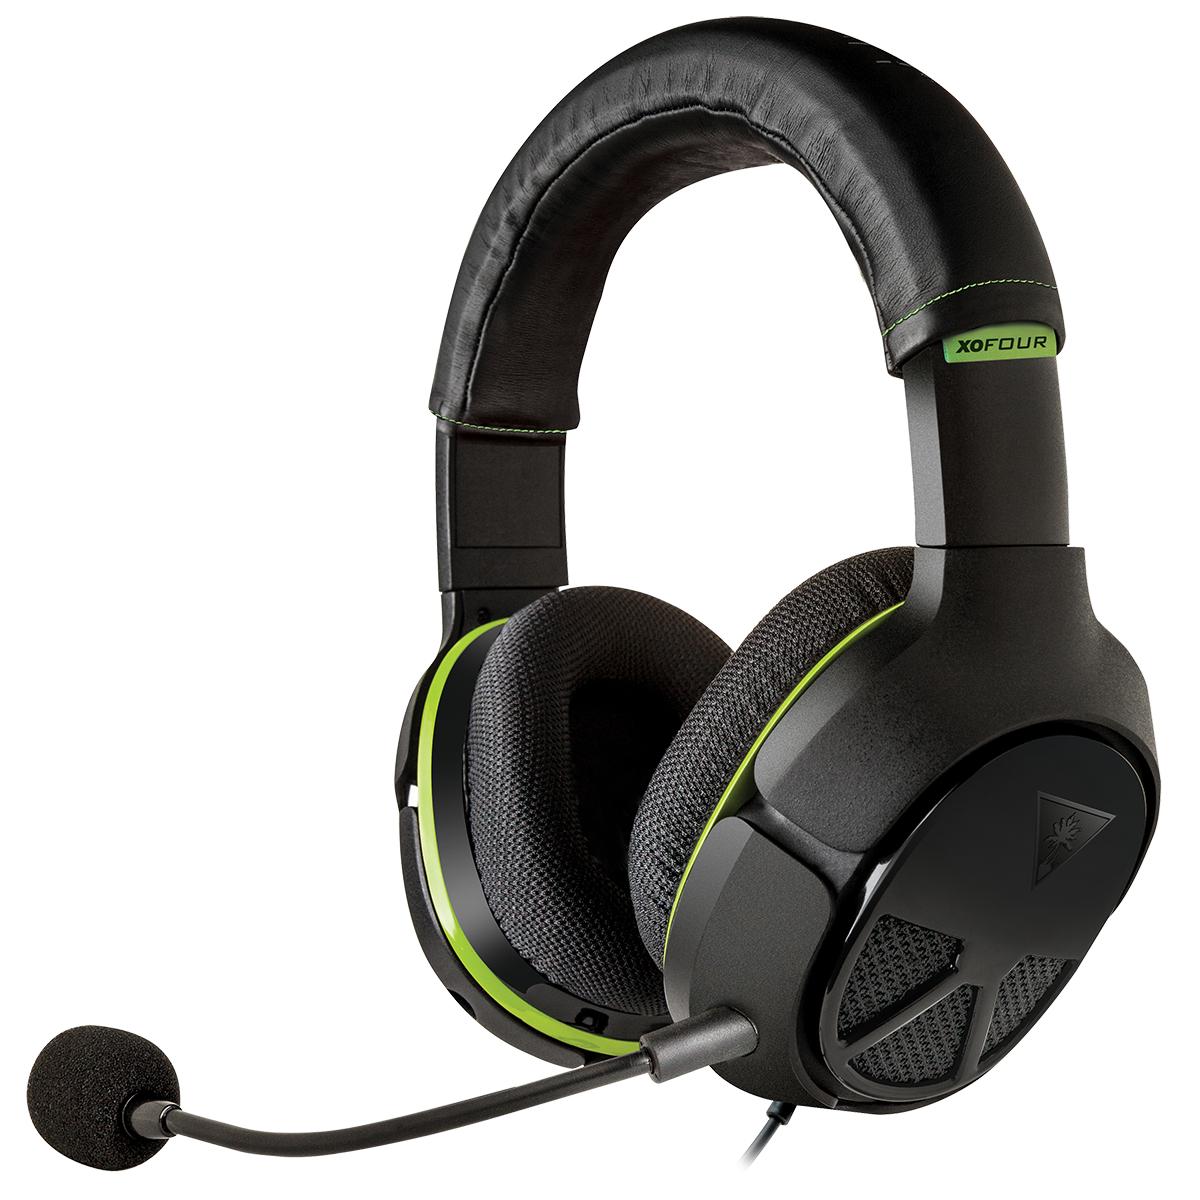 Turtle Beach XO Four Stealth Xbox One Gaming Headset £35 Tesco